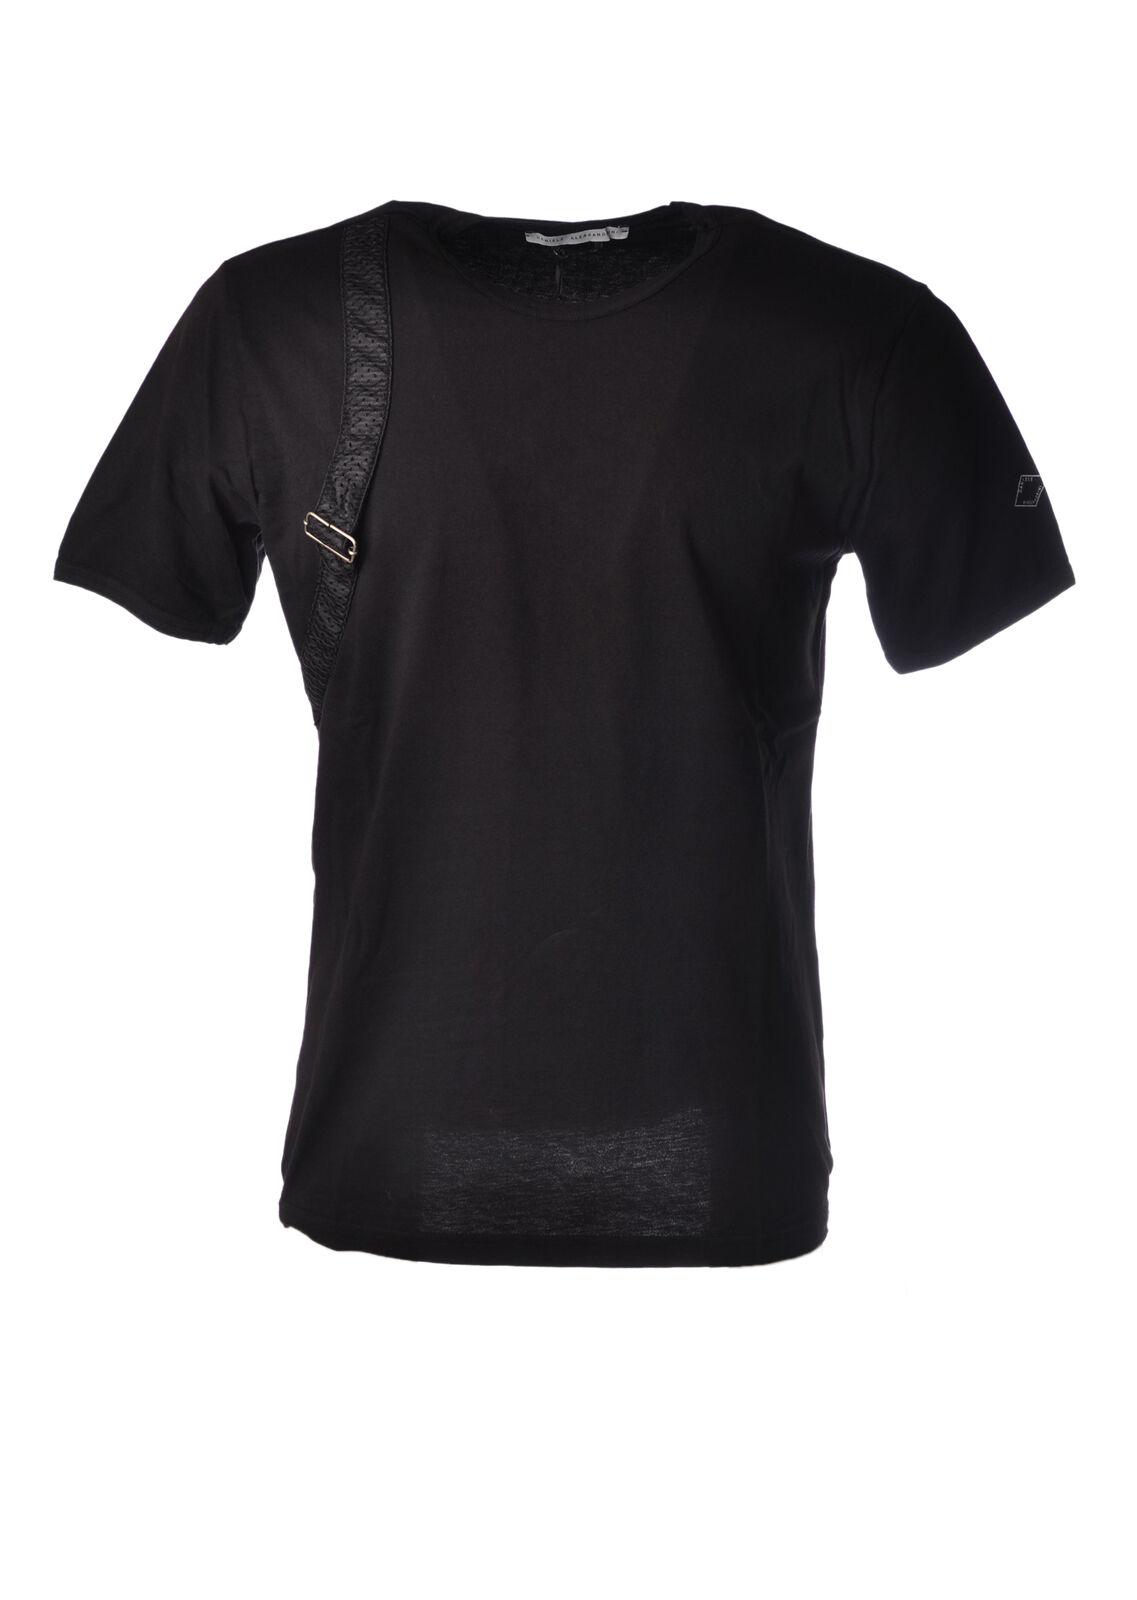 Daniele Alessandrini - Topwear-T-shirts - Mann - black - 5045210H184448